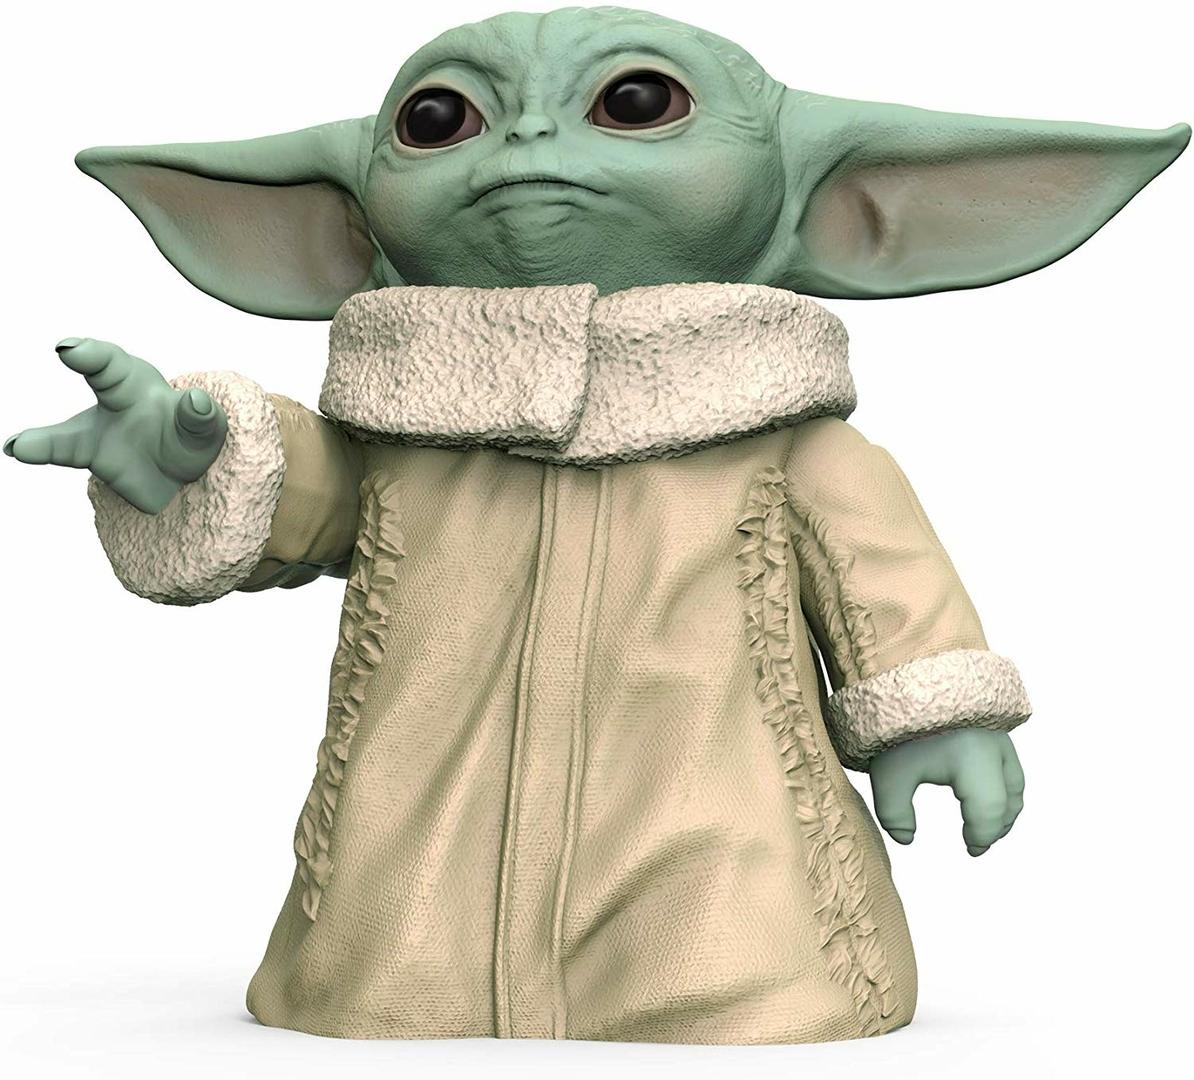 Figurine Star Wars The Mandalorian The Child - Baby Yoda 16cm 1001 Figurines 1